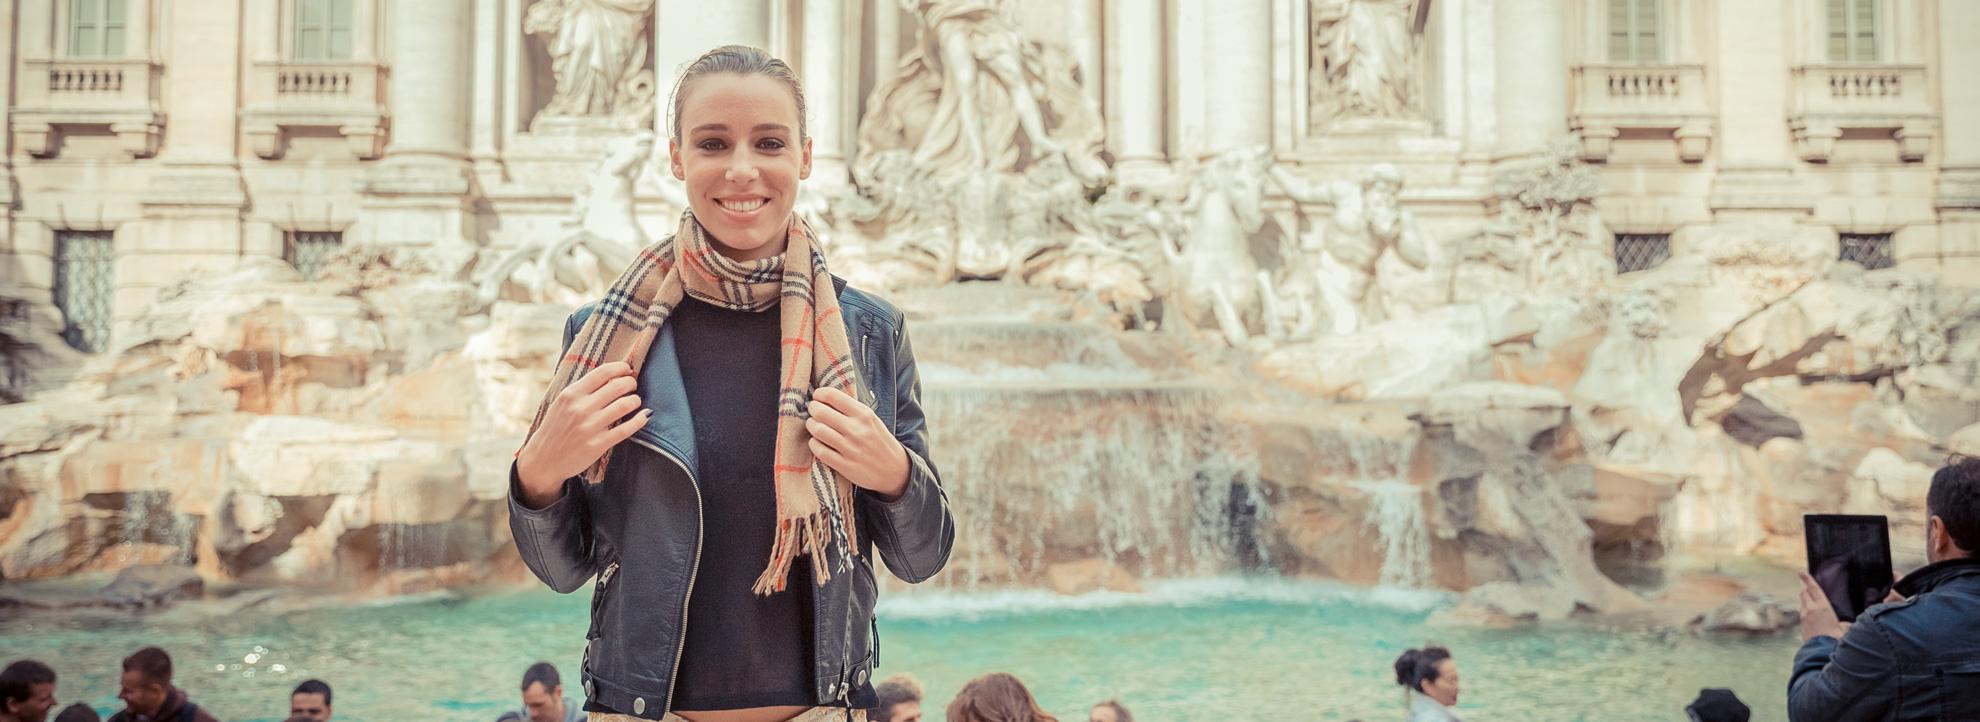 Fontana di Trevi Rome Photo Tour